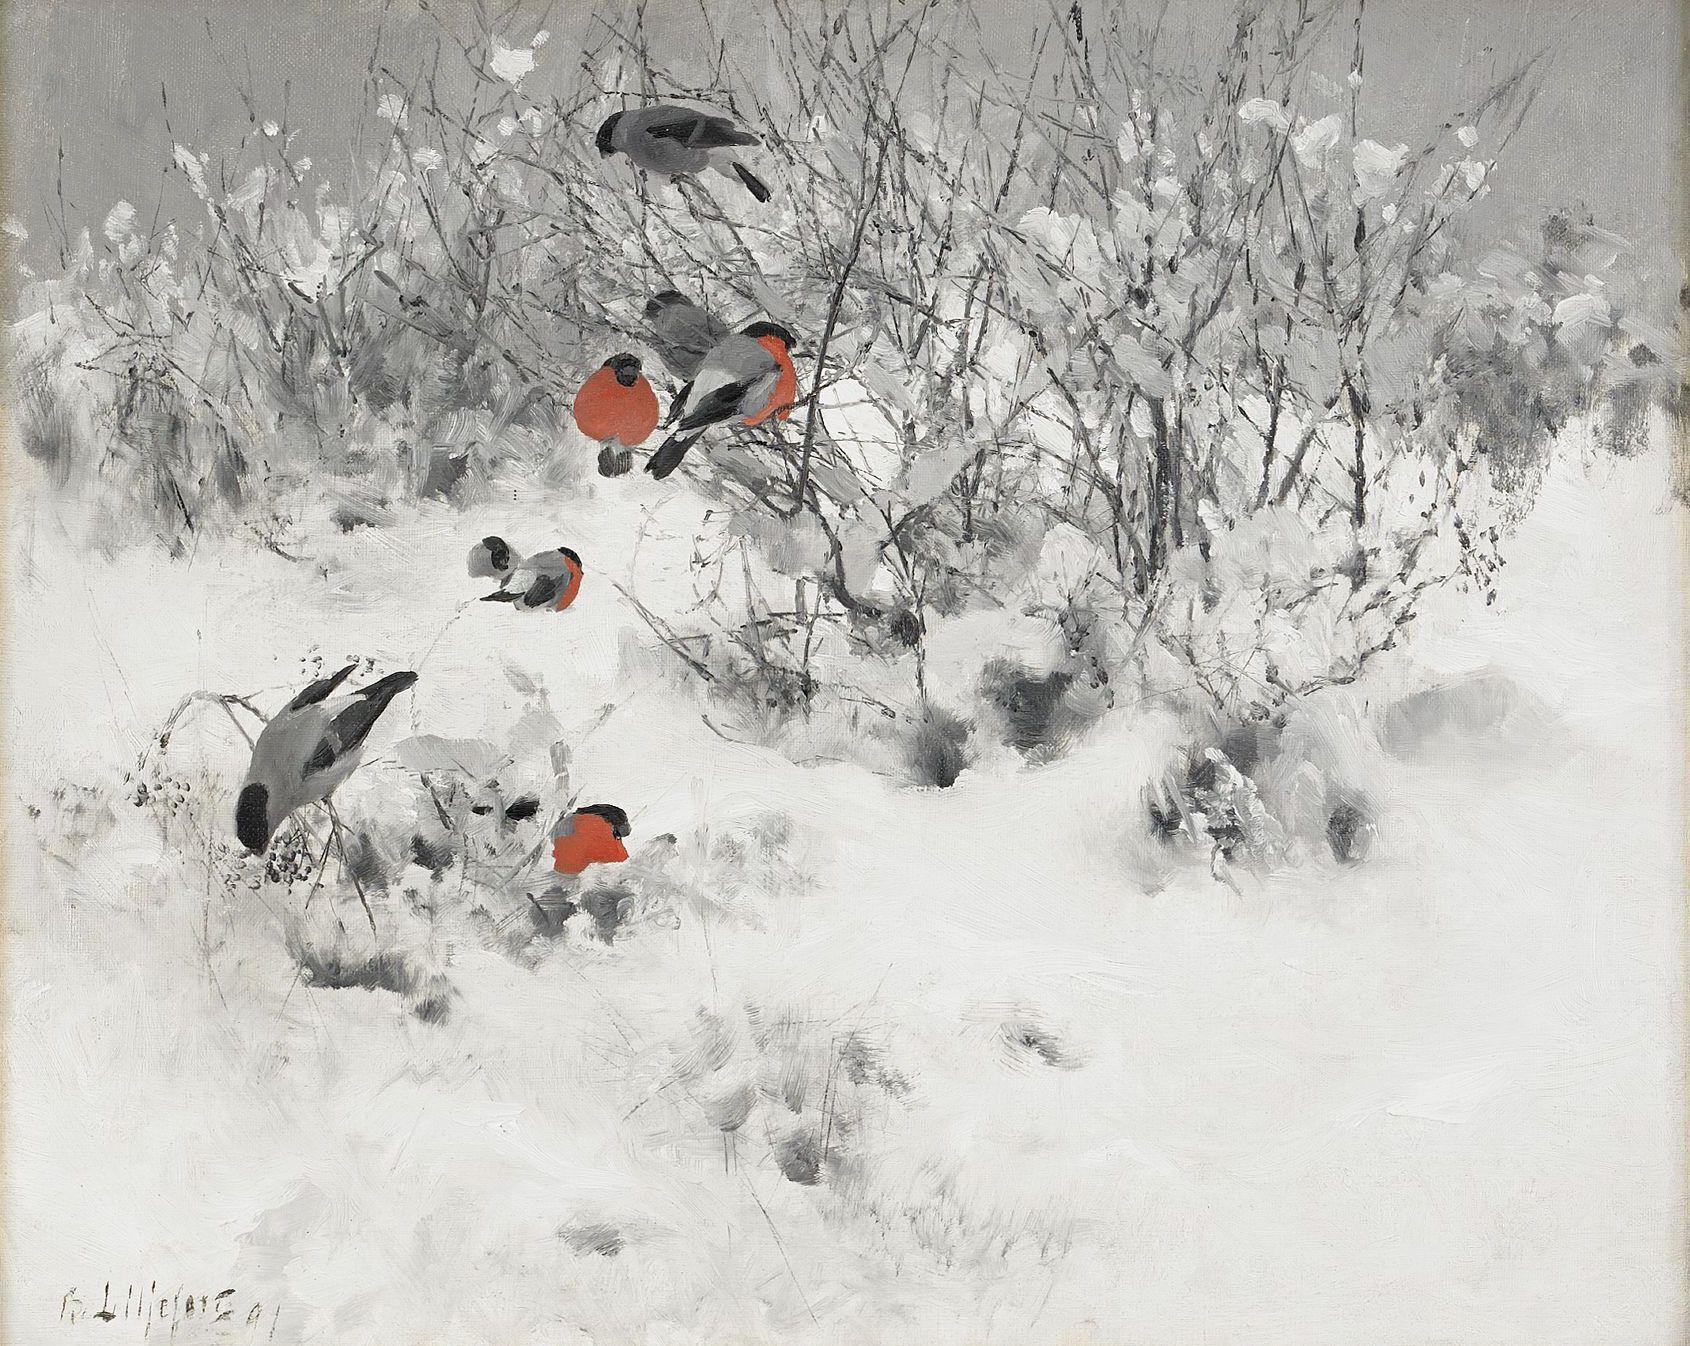 Winter Scenery Paintings Canada